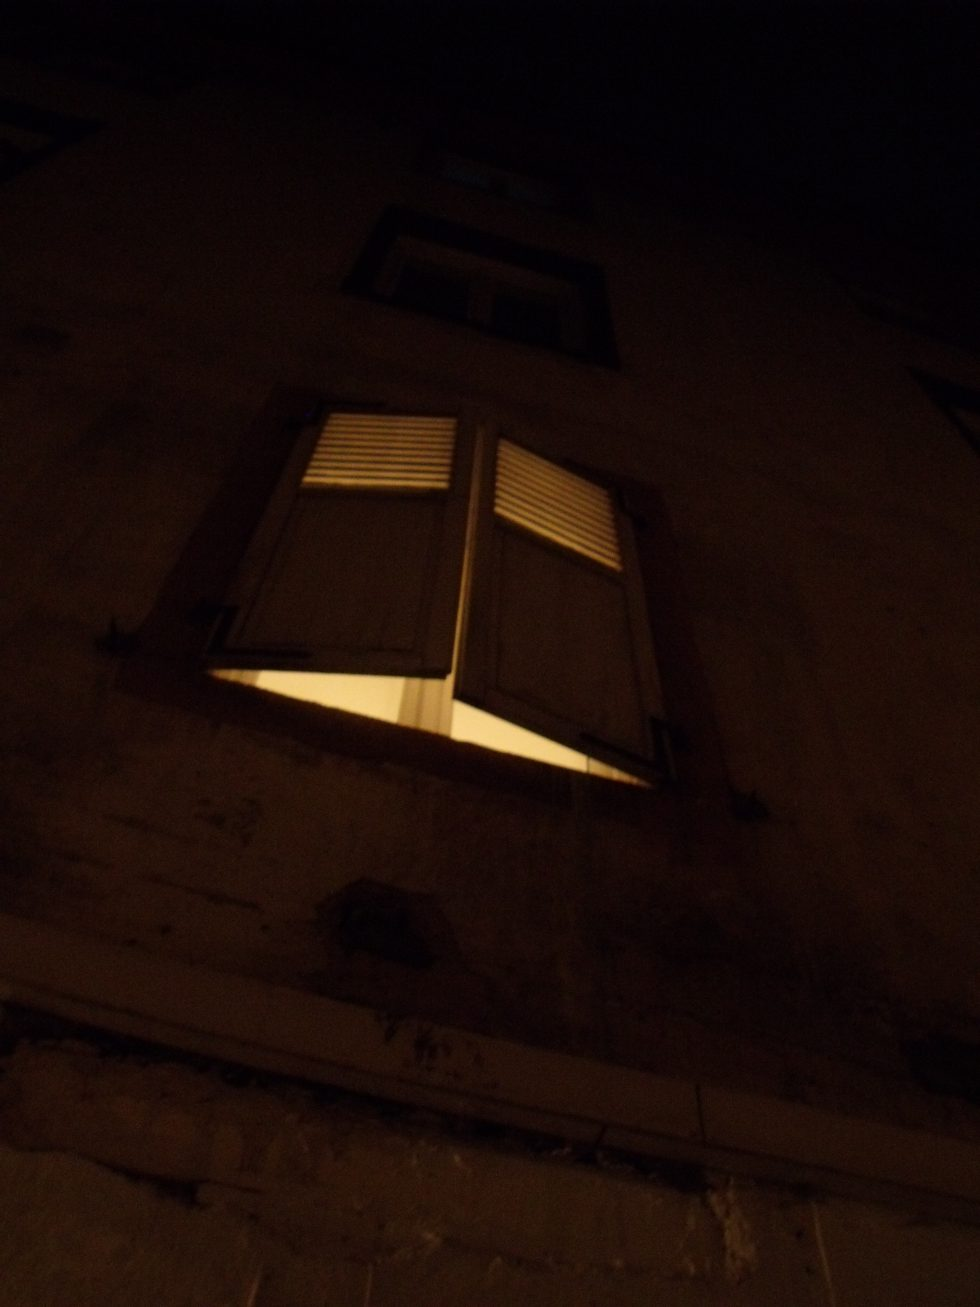 fenêtre-autiste-artiste-Karim-TATAI-Strasbourg